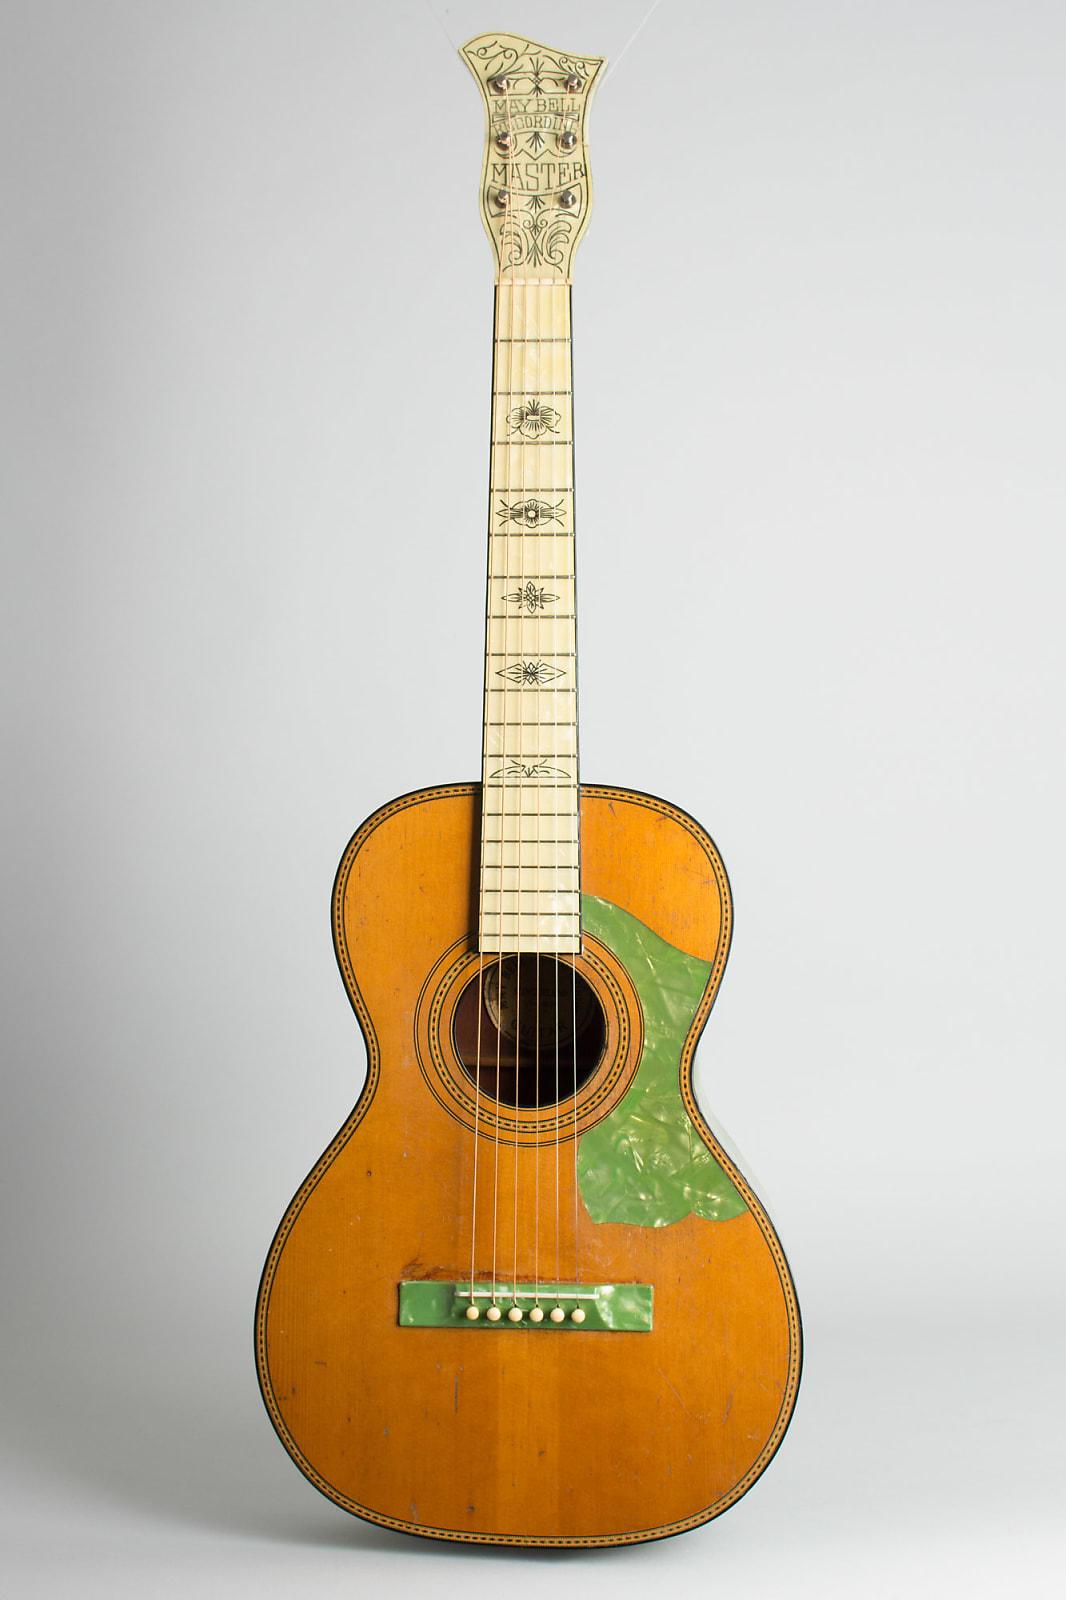 Slingerland  May Bell Recording Master Model #12 Flat Top Acoustic Guitar,  c. 1931